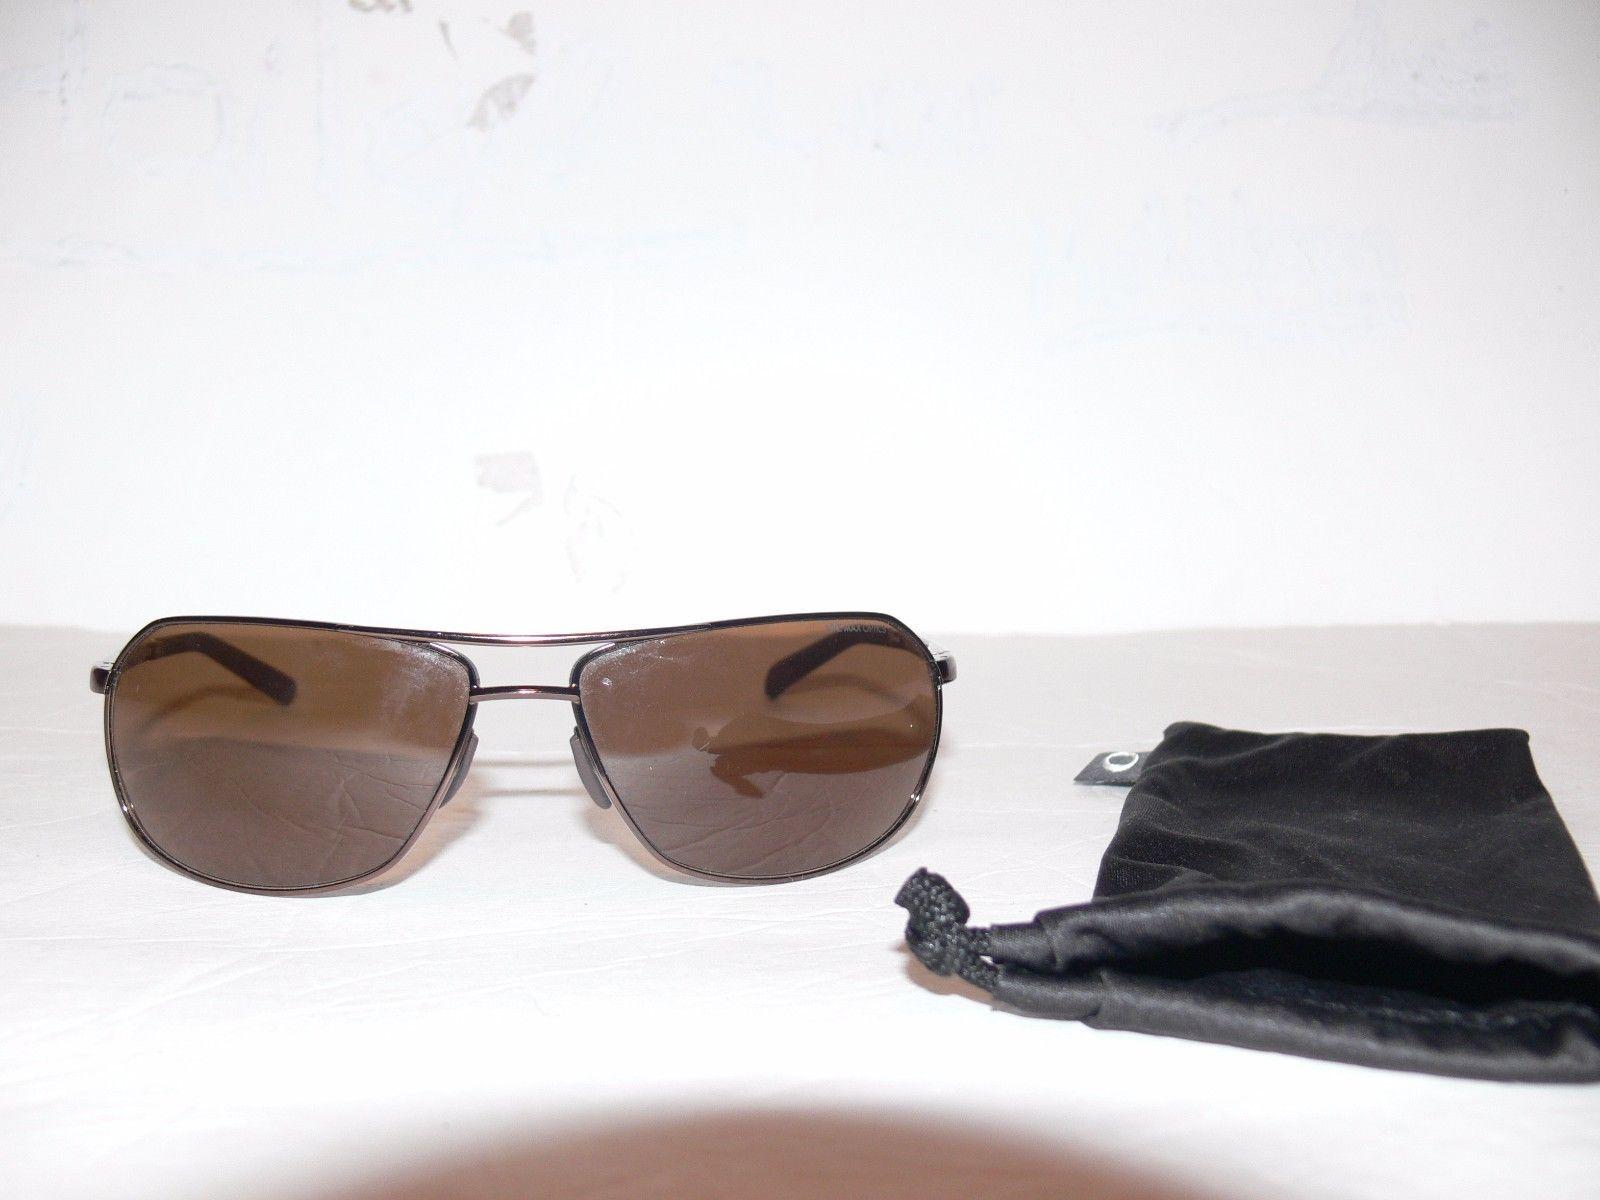 c4a9757ee9d Nike Avid Iii Sunglasses Walnut EV0591 203 and 50 similar items